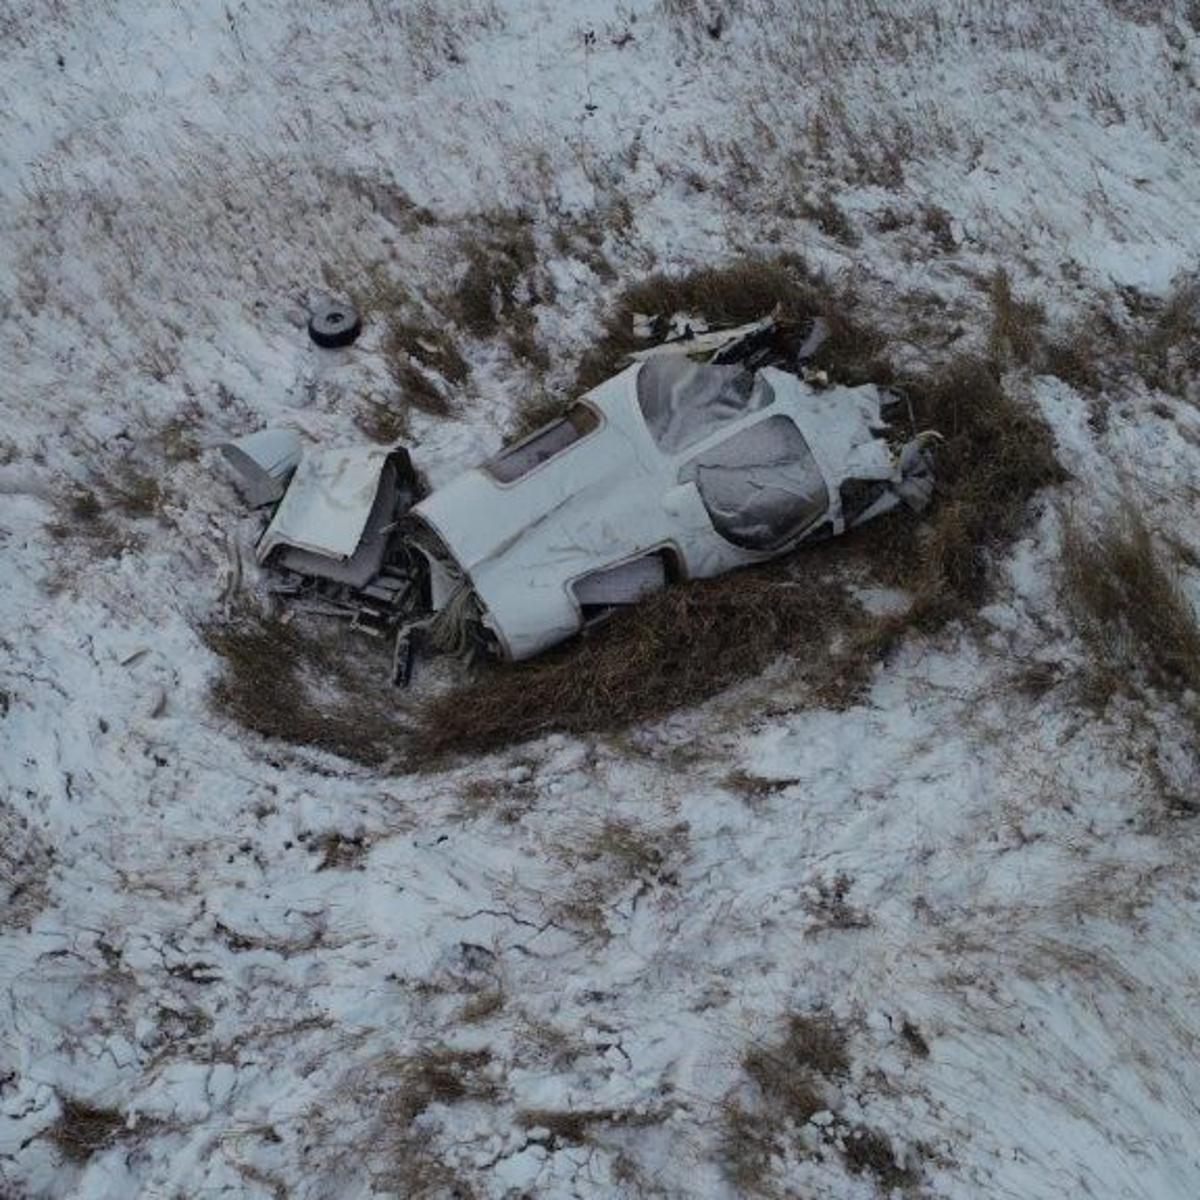 Crashed North Dakota air ambulance didn't send distress call